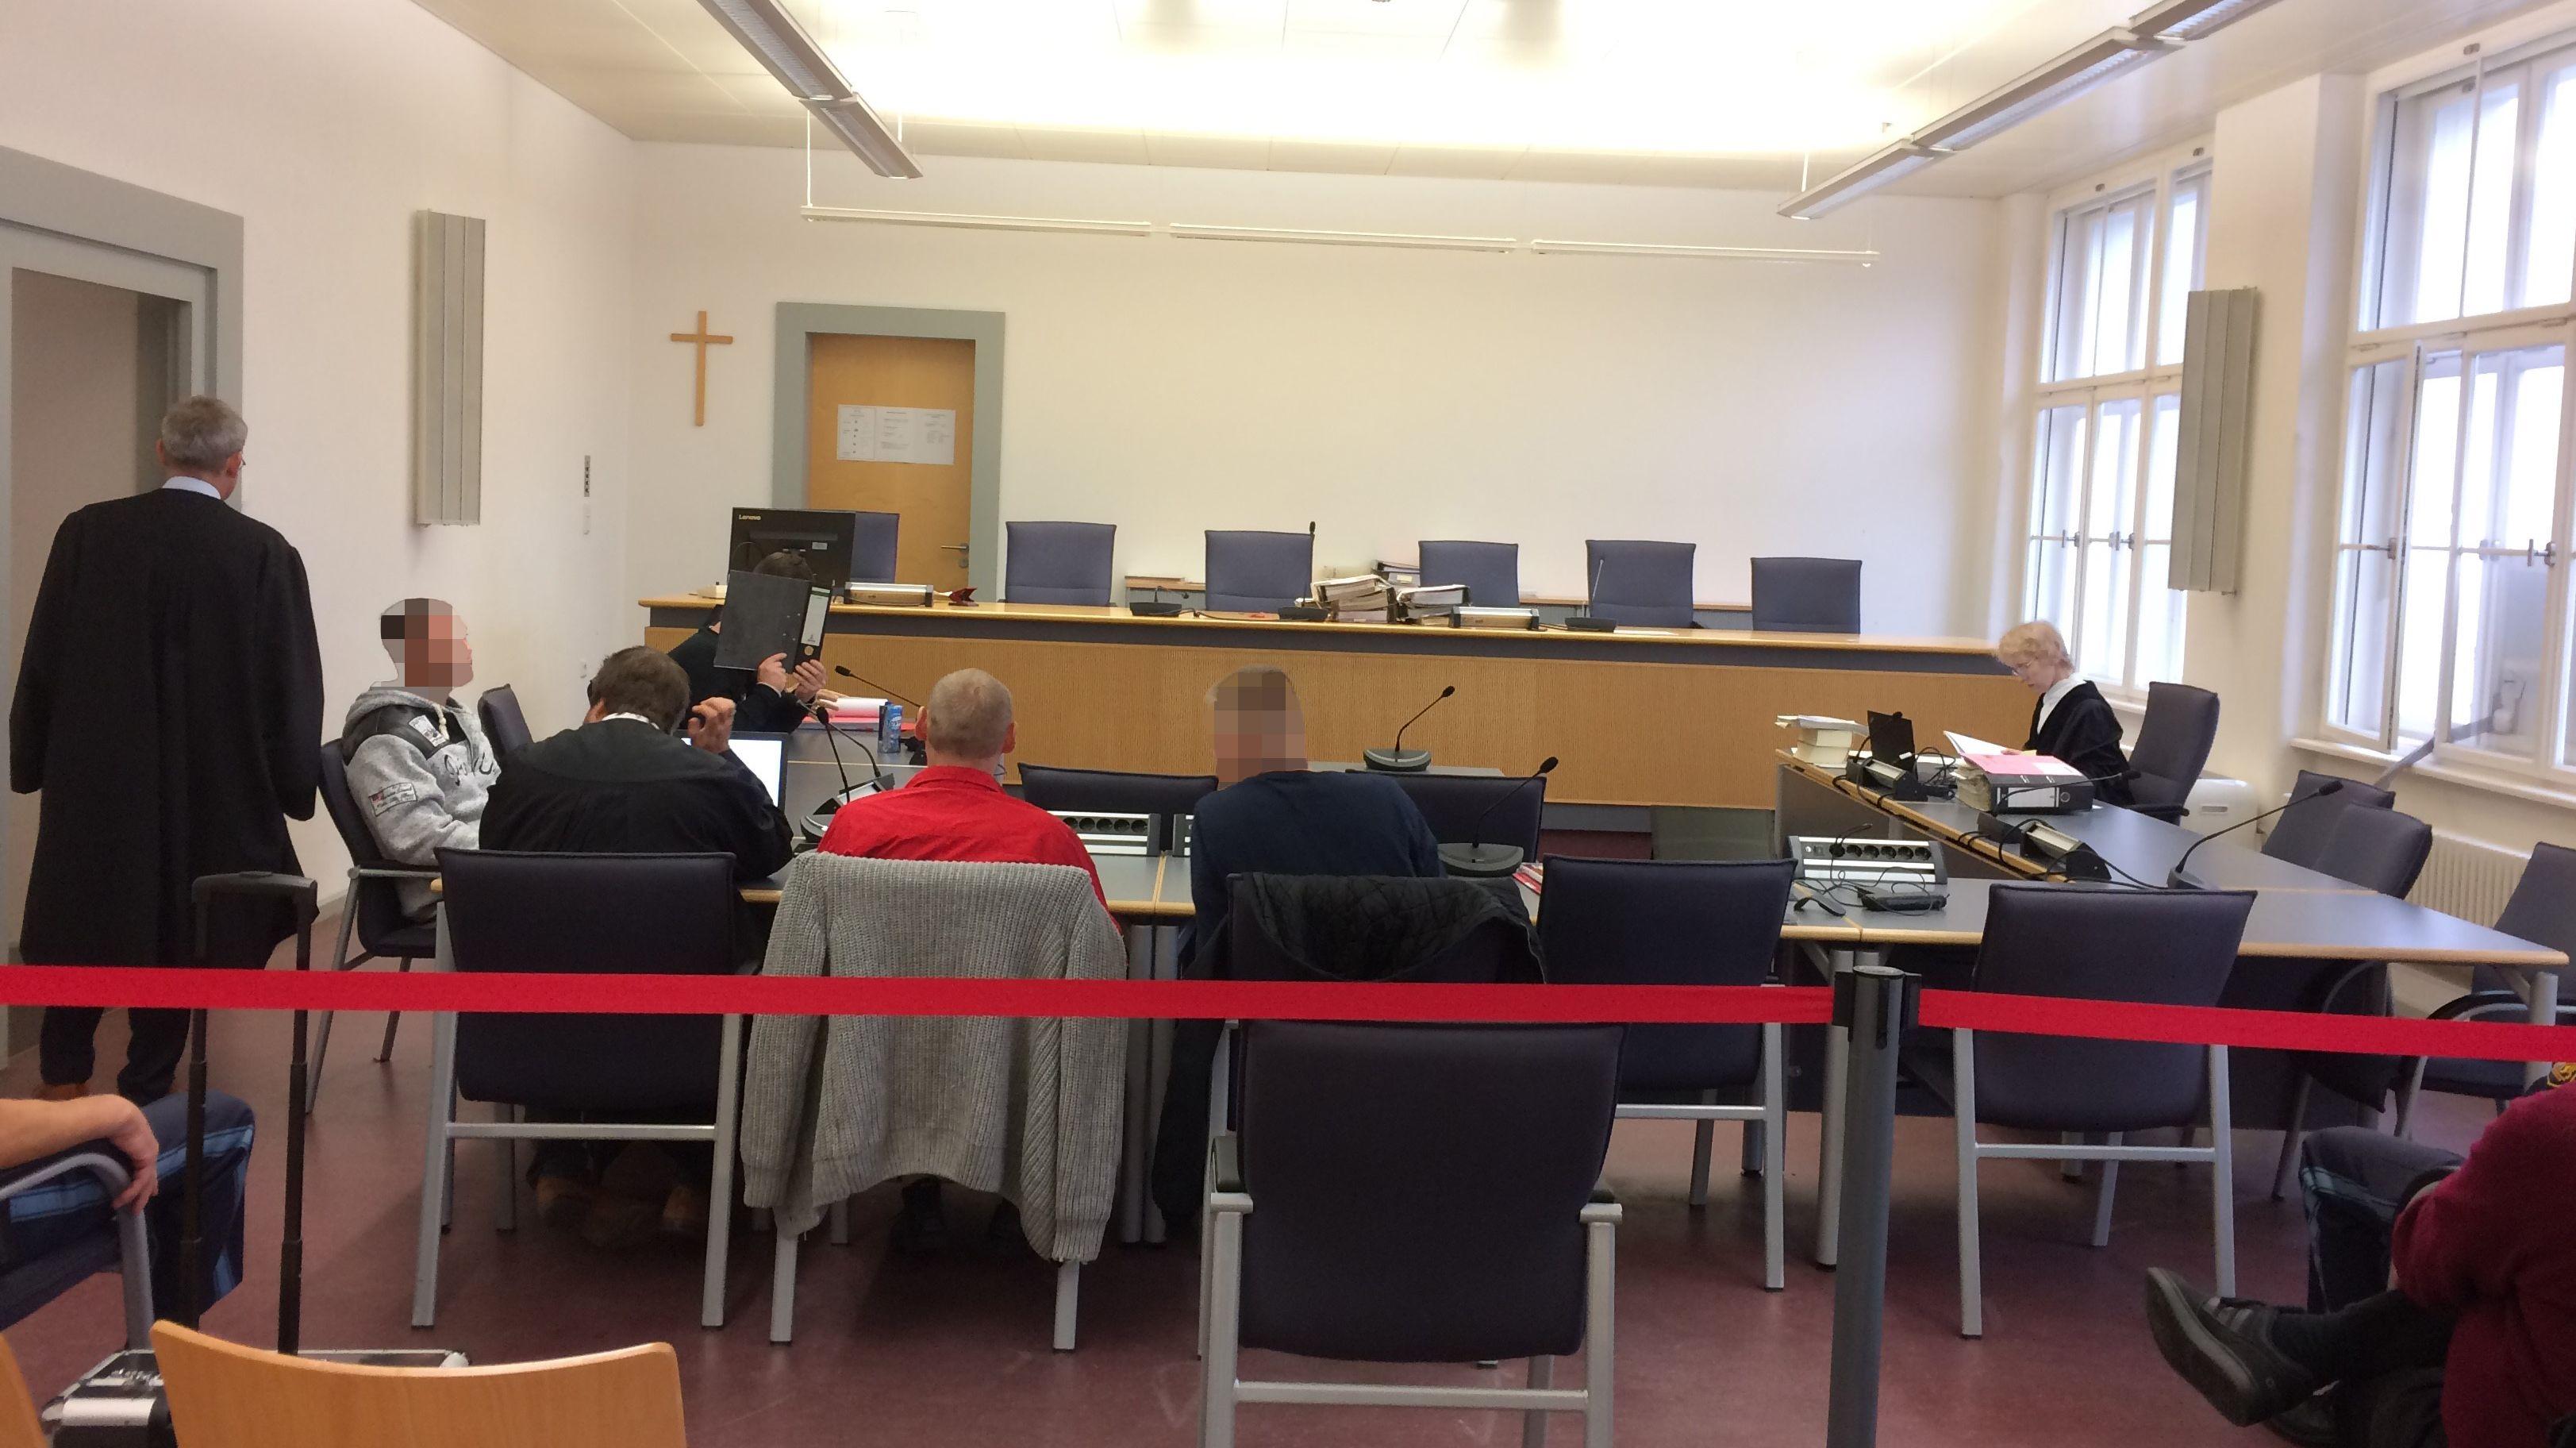 Gerichtssaal am Landgericht Regensburg